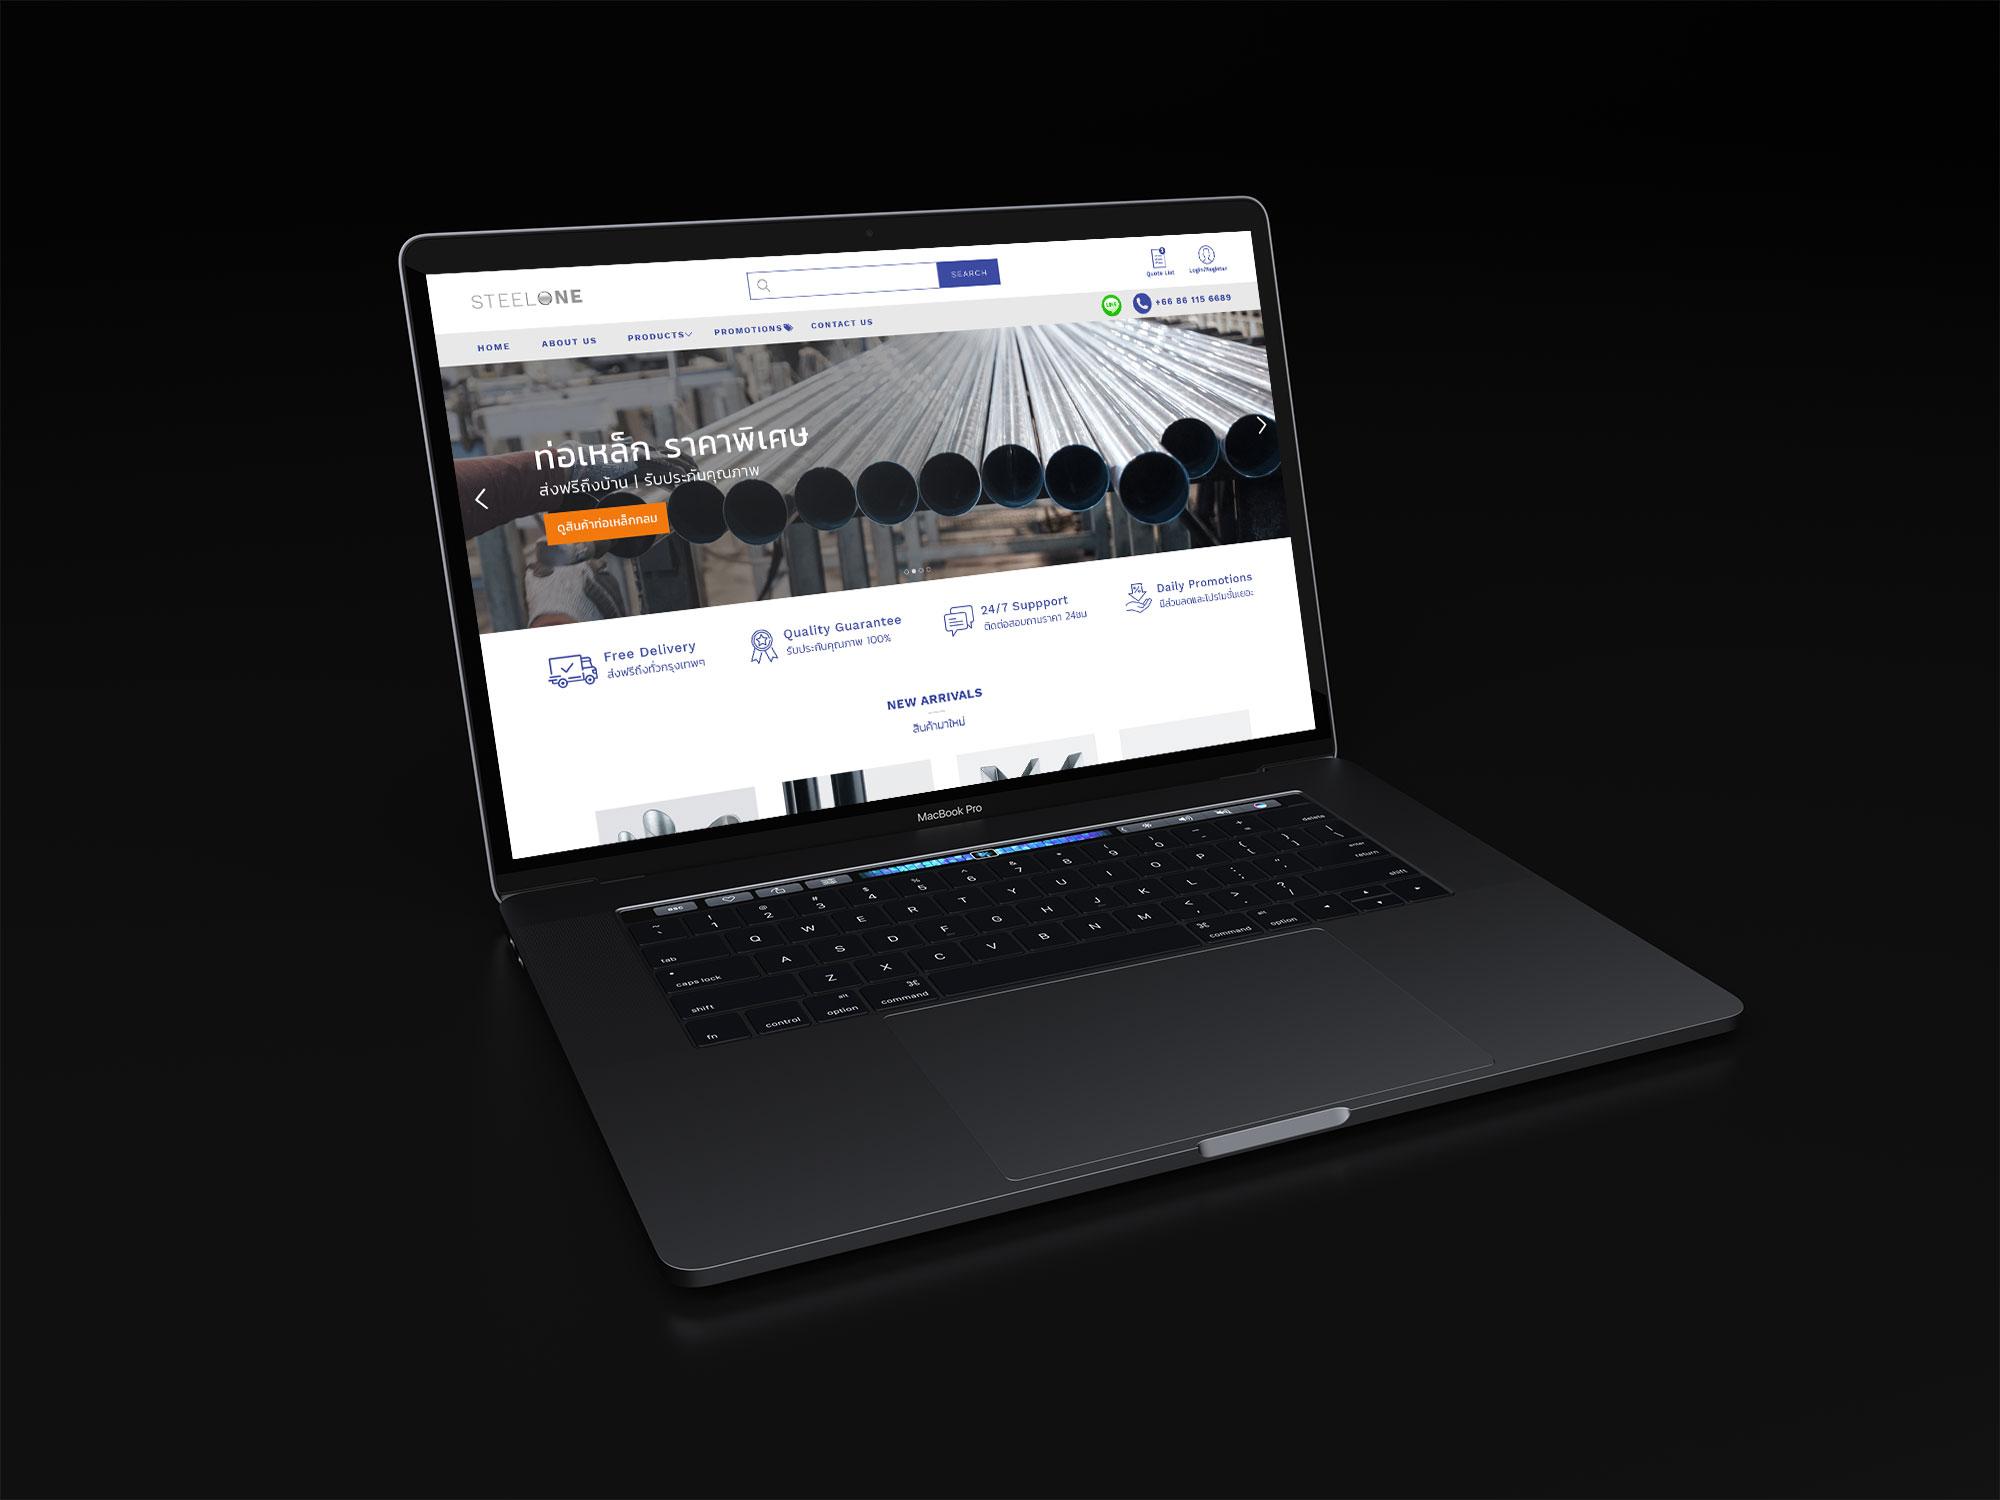 Steel pipes online website bangkok